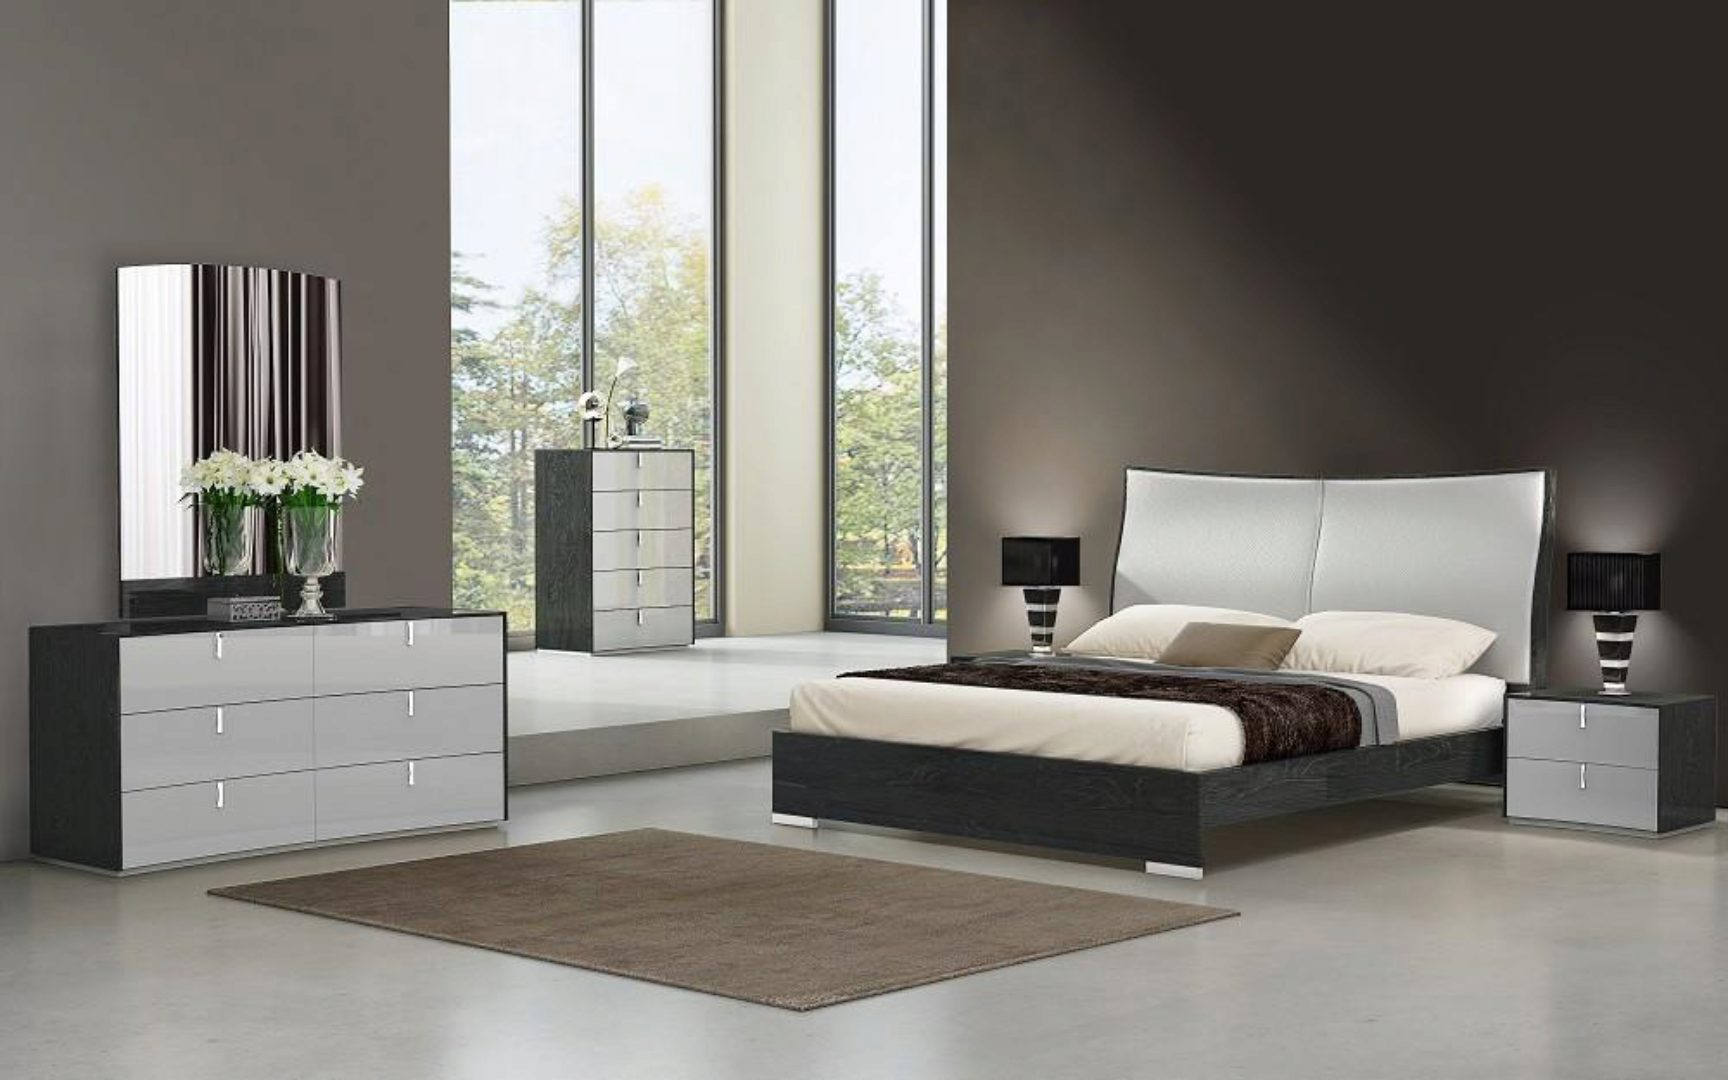 jm vera modern grey finish  light grey eco leather king